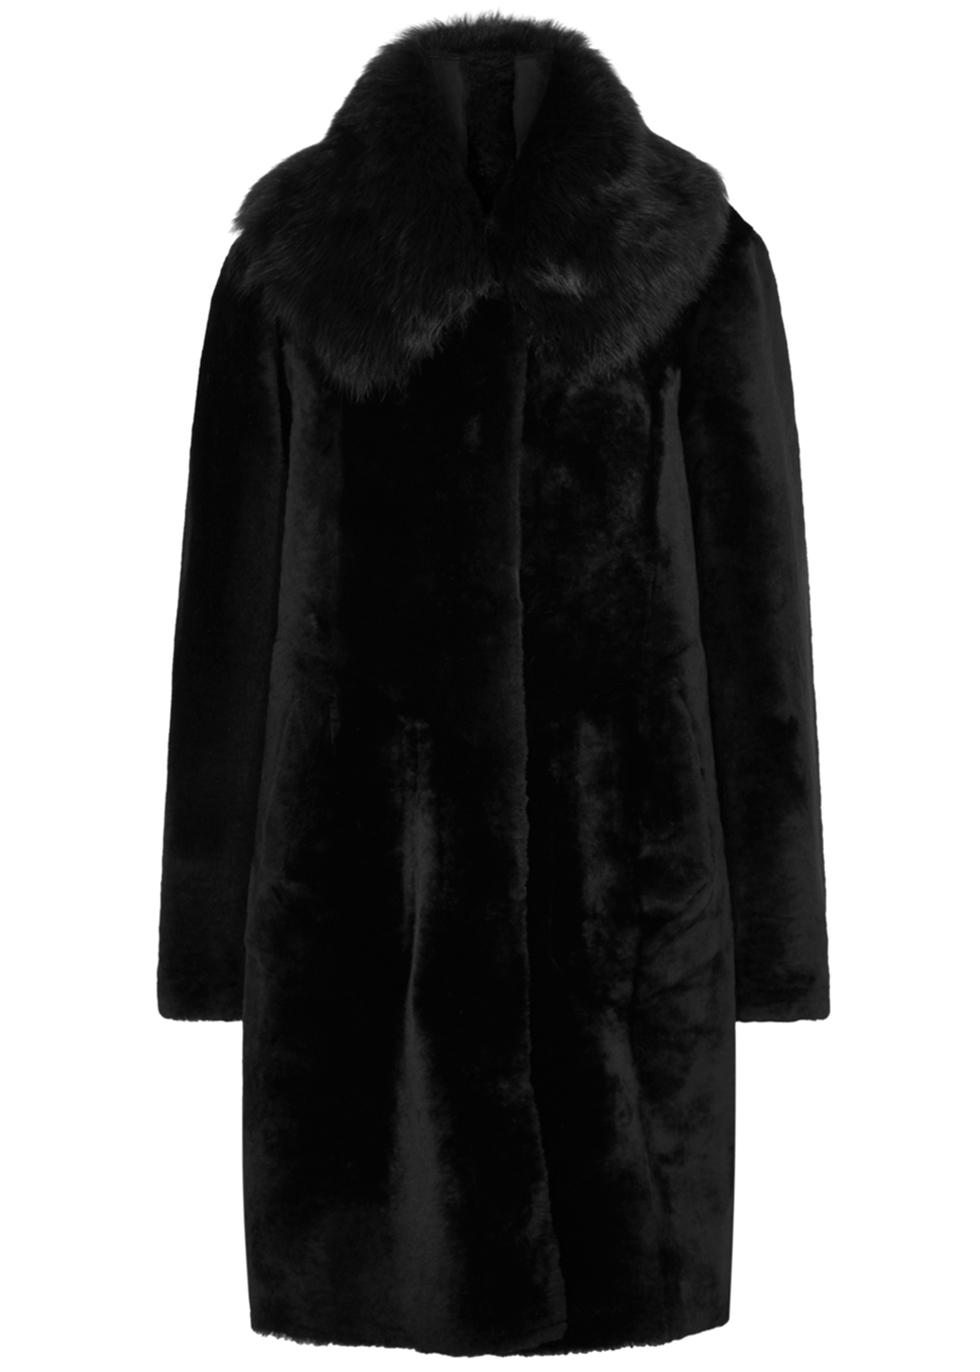 DOM GOOR X Mercer7 Black Reversible Shearling Coat